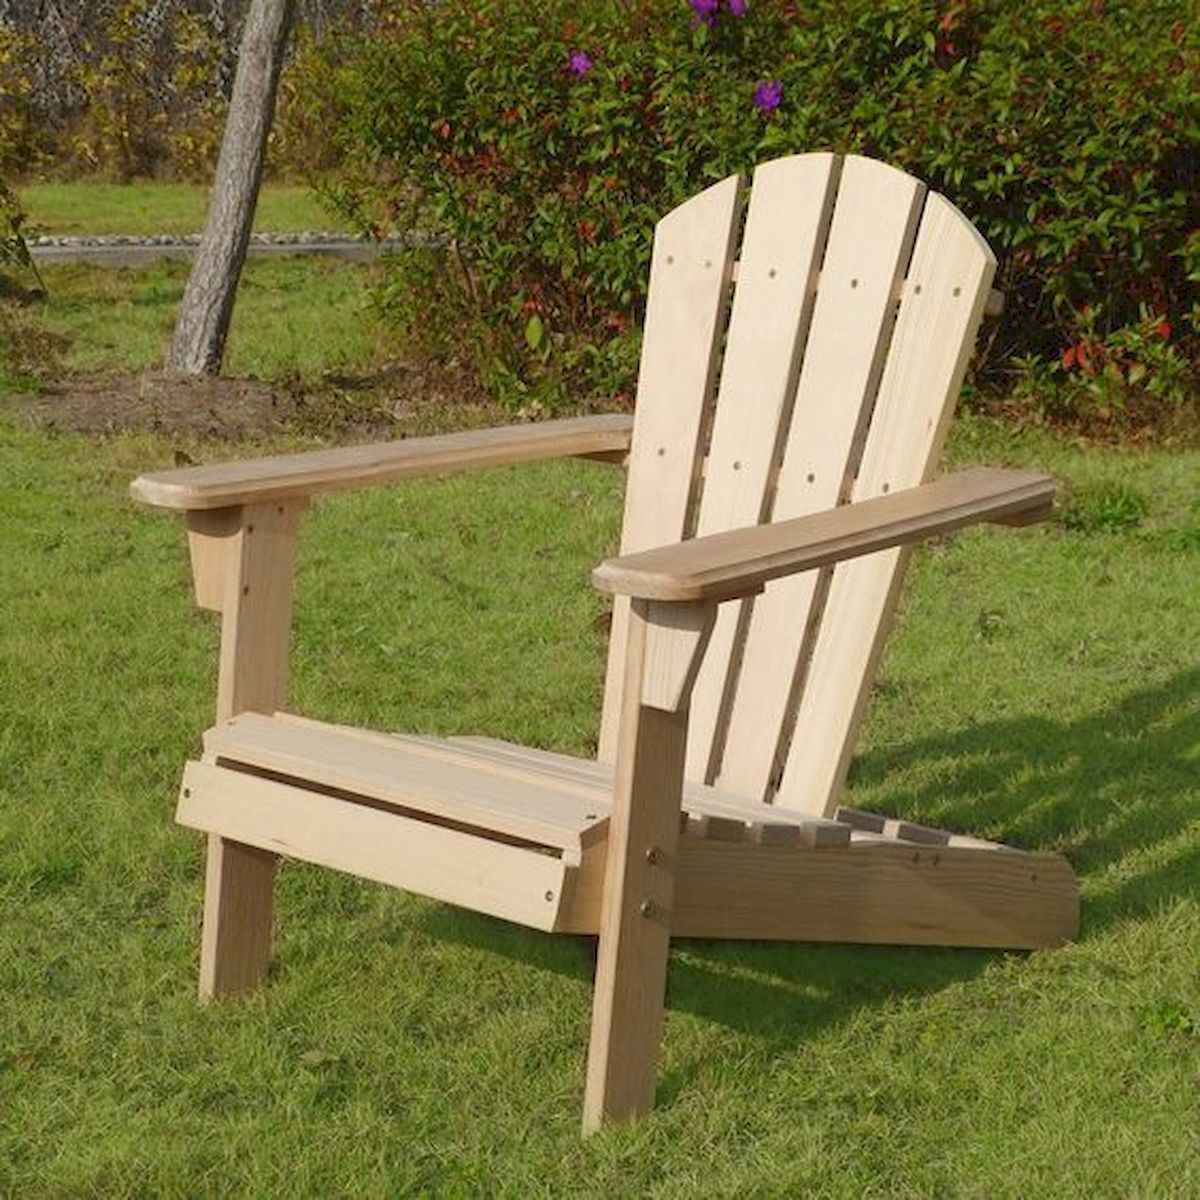 60 Amazing DIY Projects Otdoors Furniture Design Ideas (44)